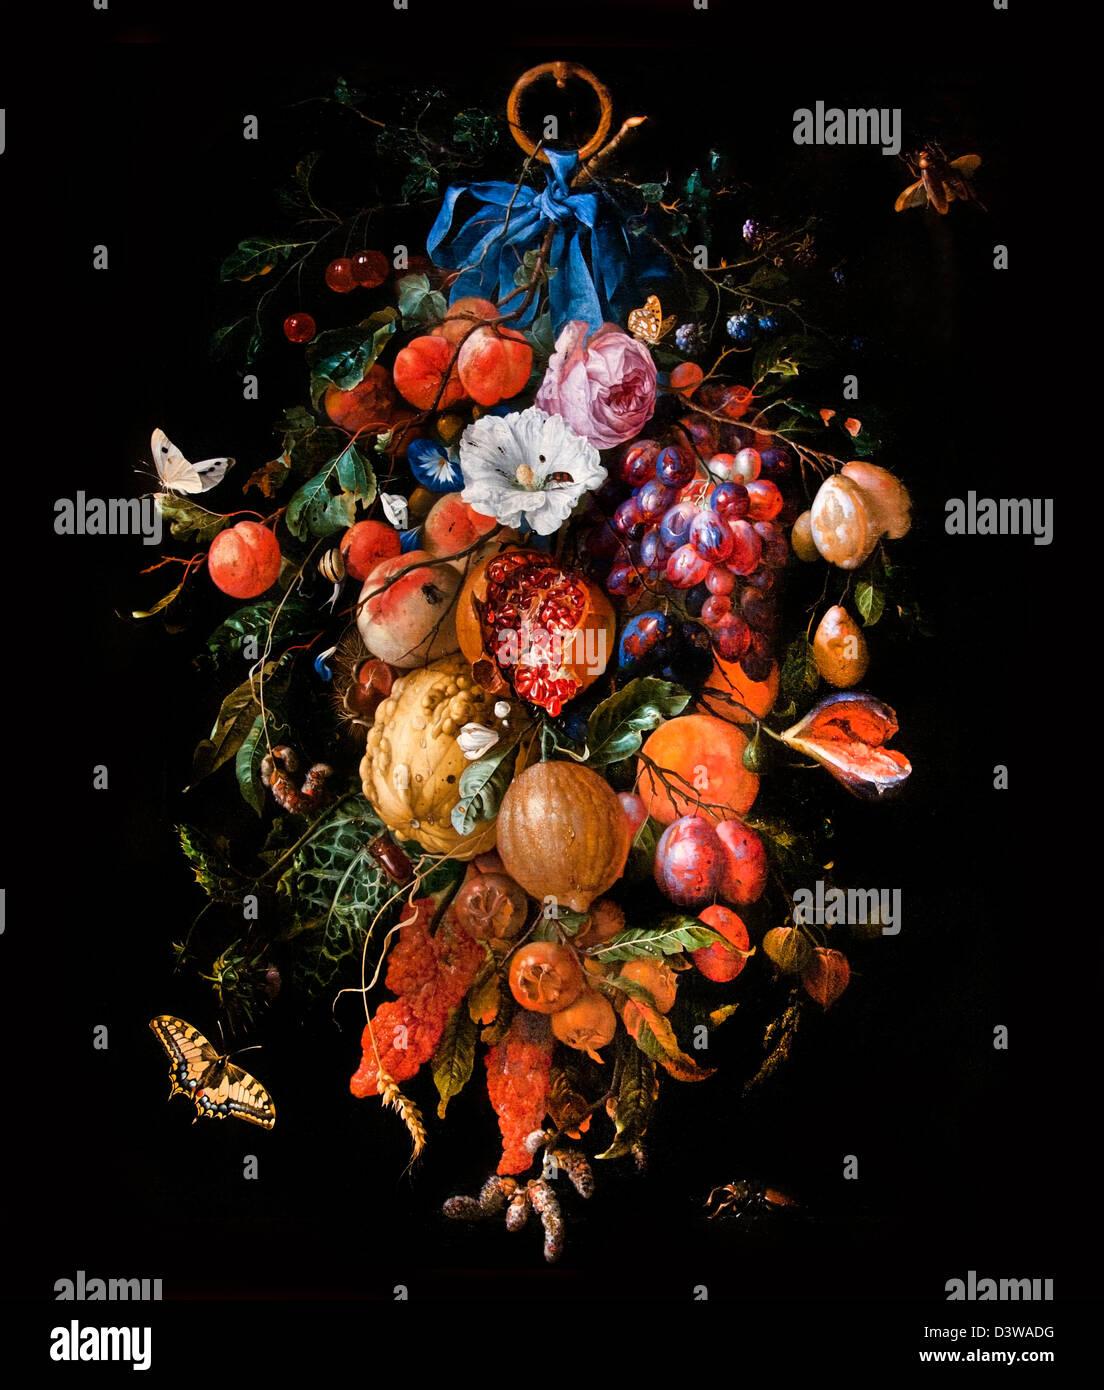 Festone di fiori e frutta 1660 Jan Davidsz de Heem olandese Paesi Bassi Foto Stock